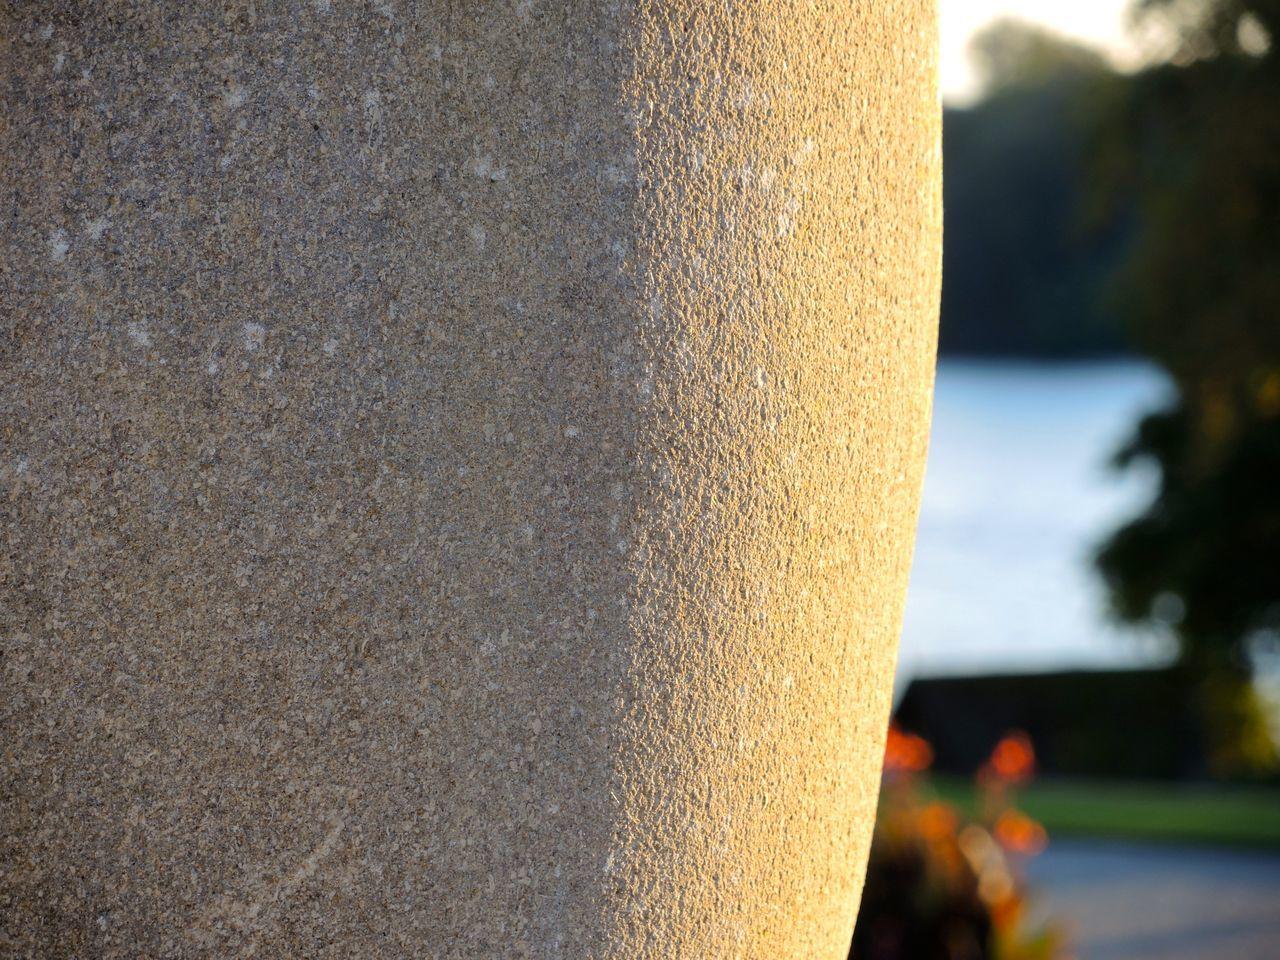 Blenheim Palace, Oxfordshire, World Heritage Site in UK. Blenheim Blenheim Palace Blenheimpalace Blenheimpalacegardens England English Estate English Landscape English Landscape Garden Historical Building Historical Garden Historical Garden Lancelot Capability Brown Landscape Architecture Tranquility United Kingdom World Heritage Site